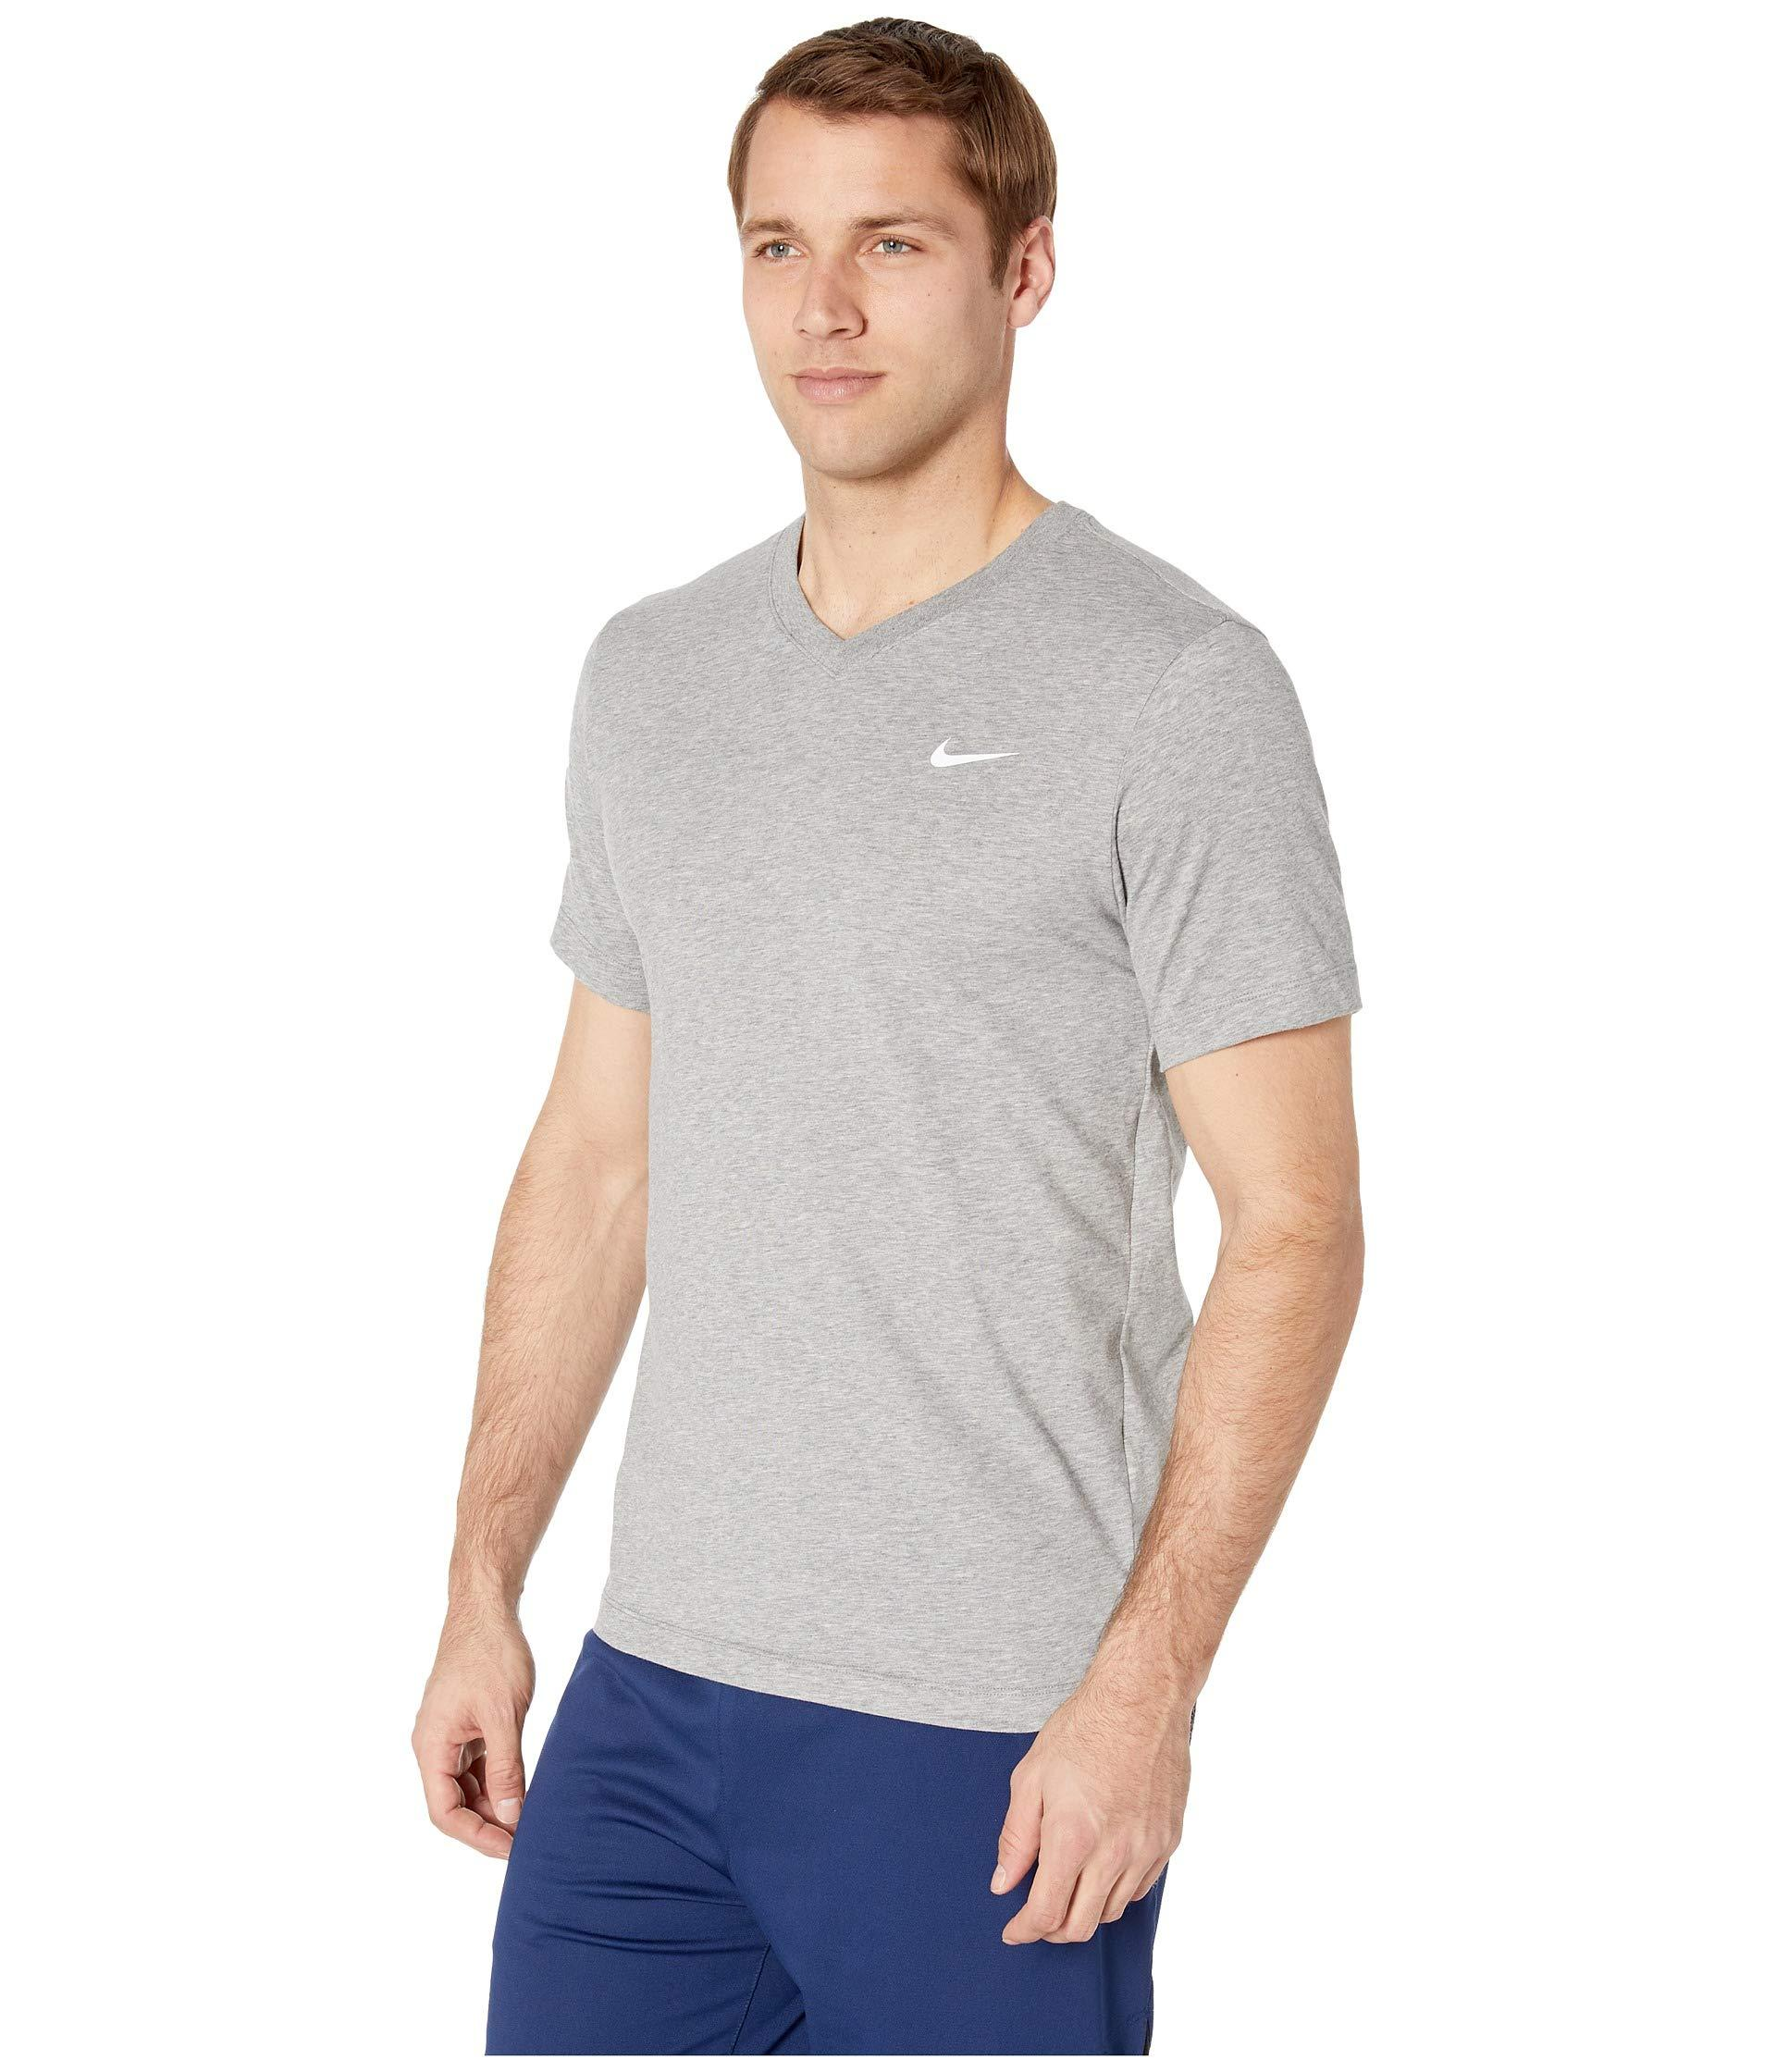 c2fe7d4bde0e Lyst - Nike Dry Tee Dri-fit Cotton V Solid (nightshade orange Peel black)  Men s Clothing in Gray for Men